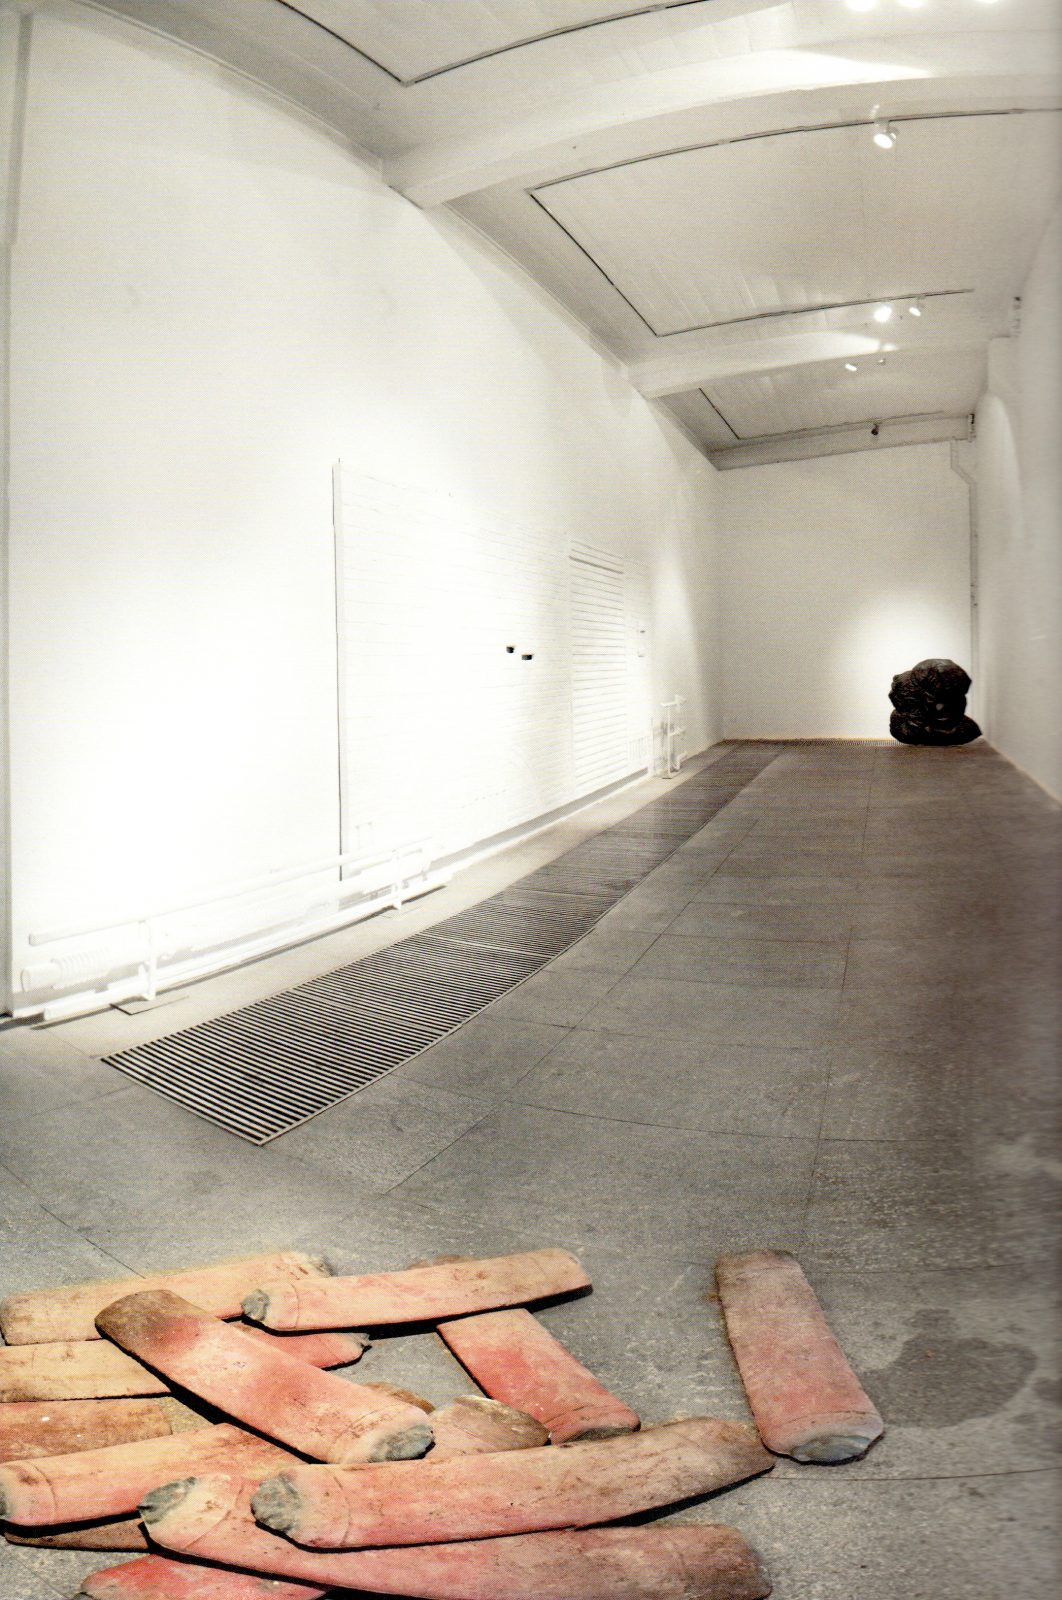 250 Kilos by Jiao Xingtao, Iron, Lacquer, 73x18x4cm, 2010